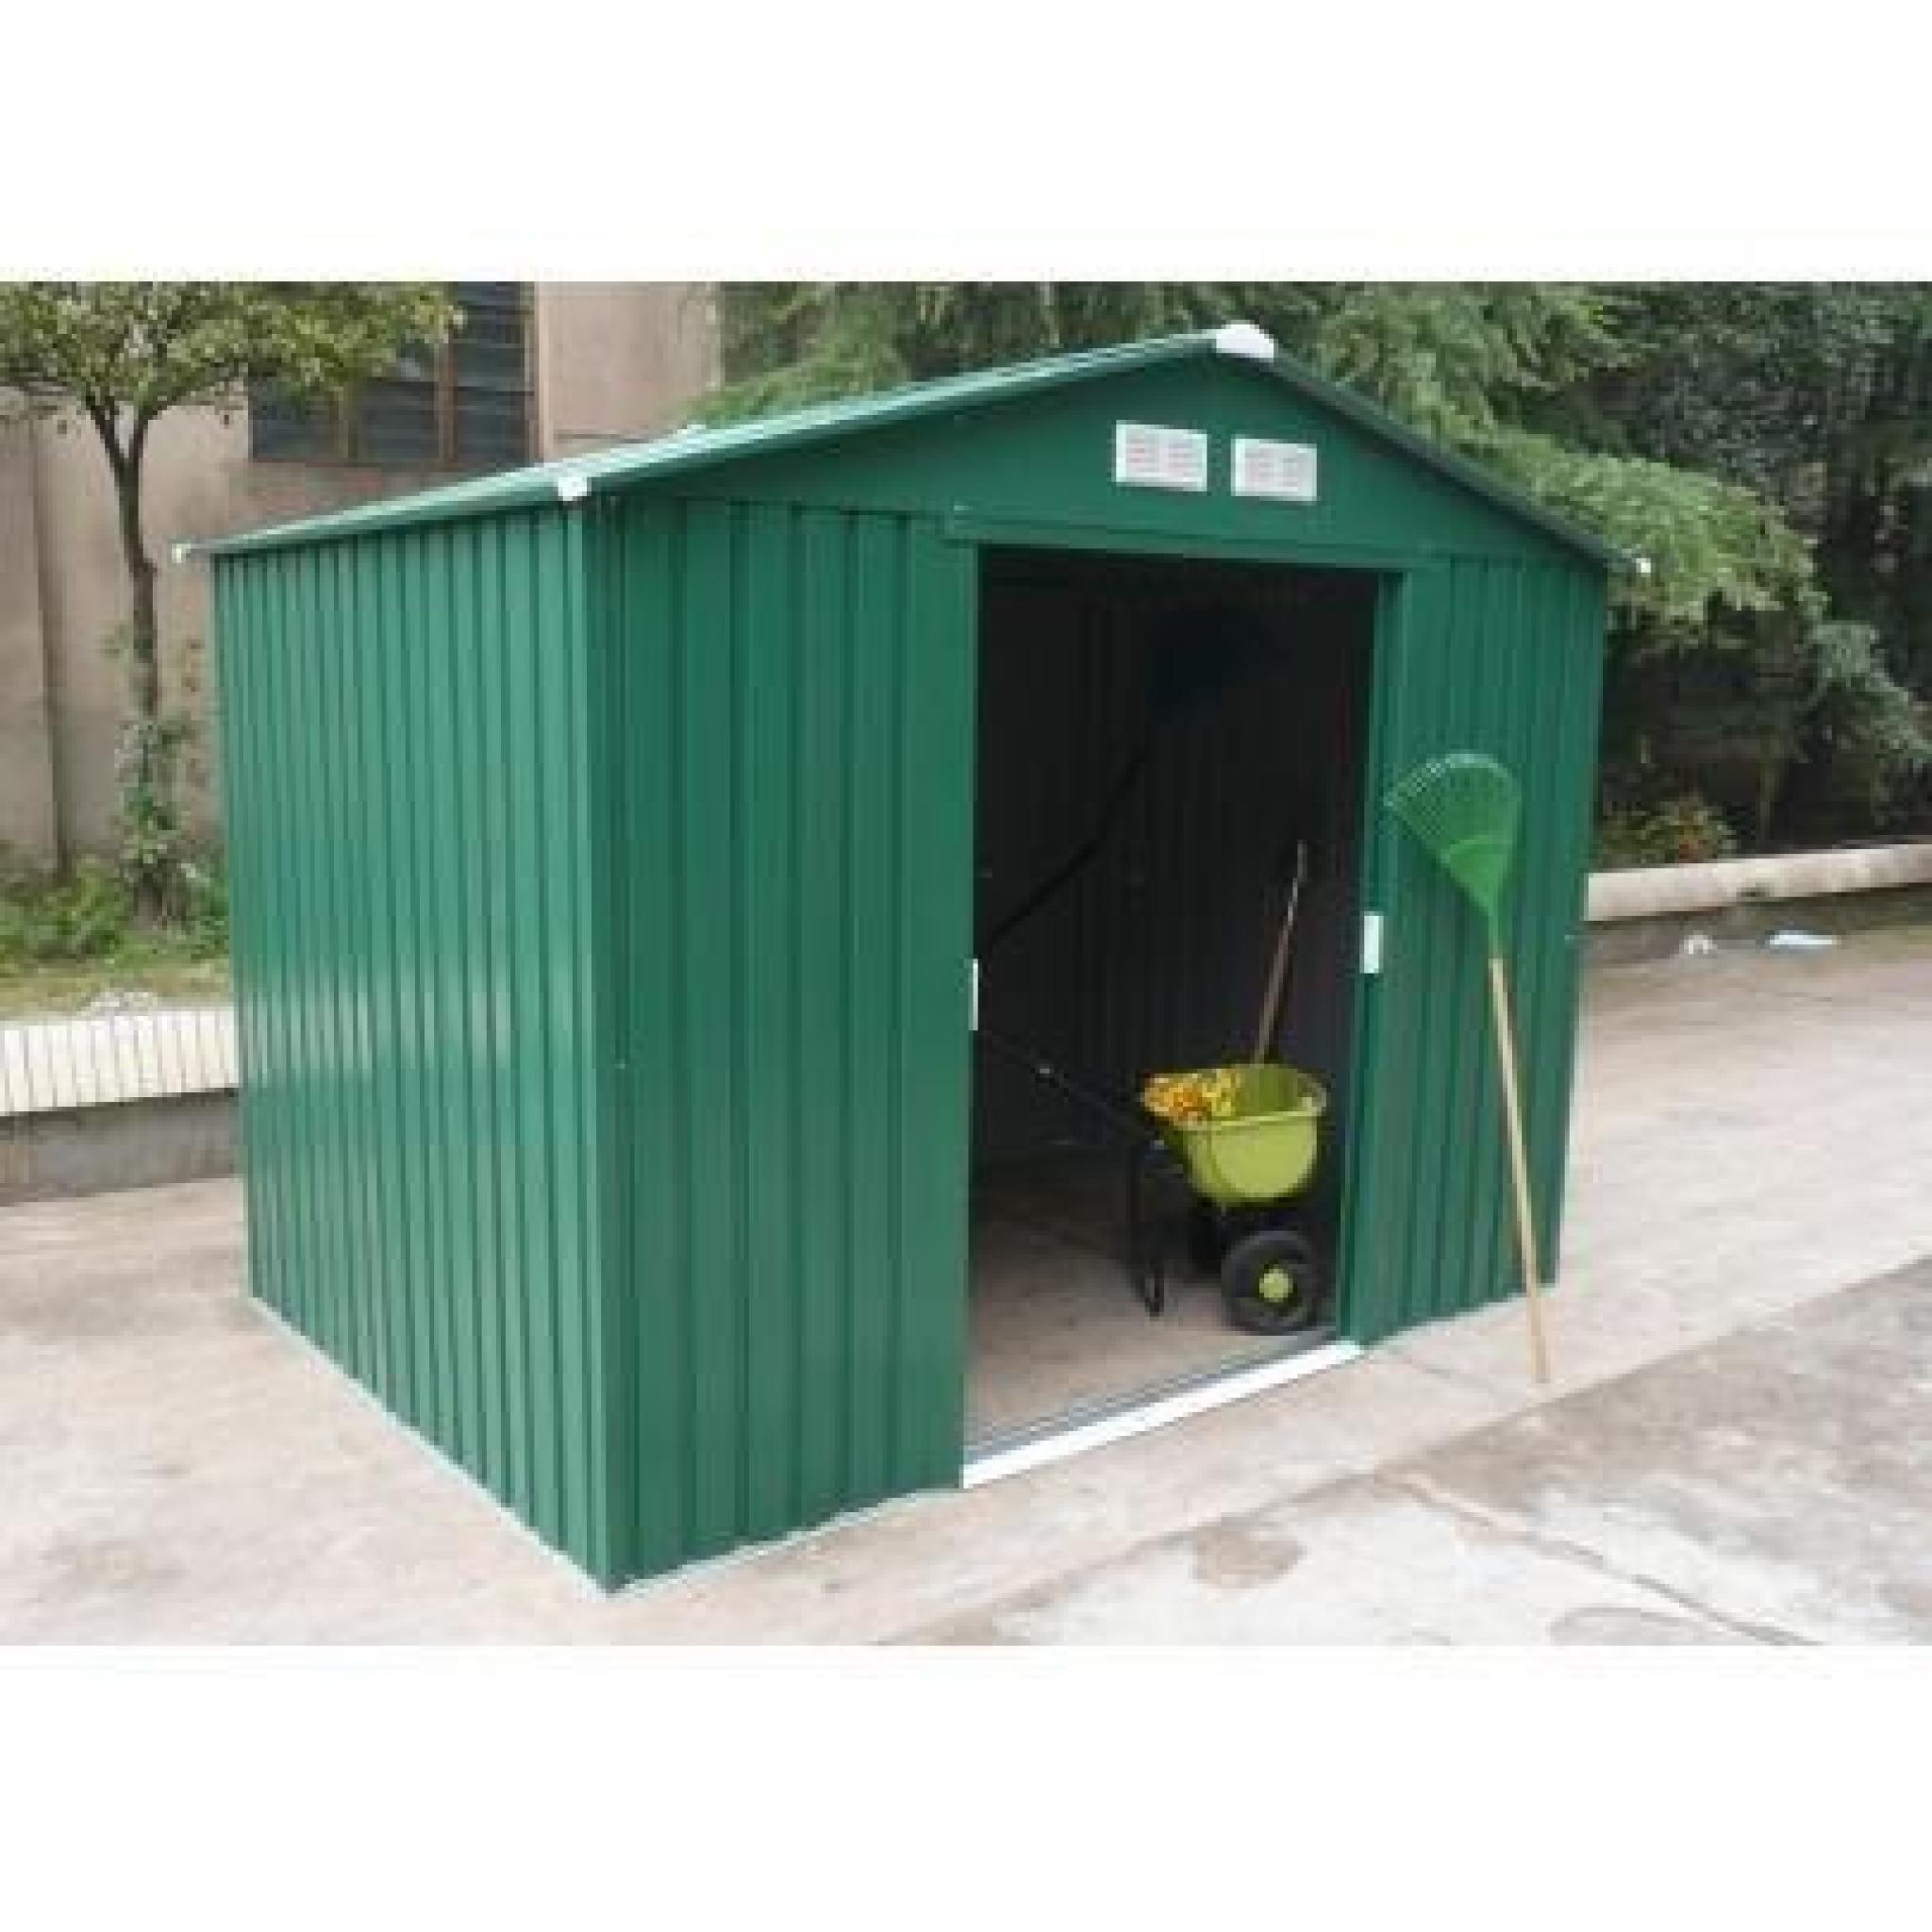 Abri De Jardin En Acier Galvanisé Kiosko - 5.9M² avec Abri De Jardin Pas Cher Metal